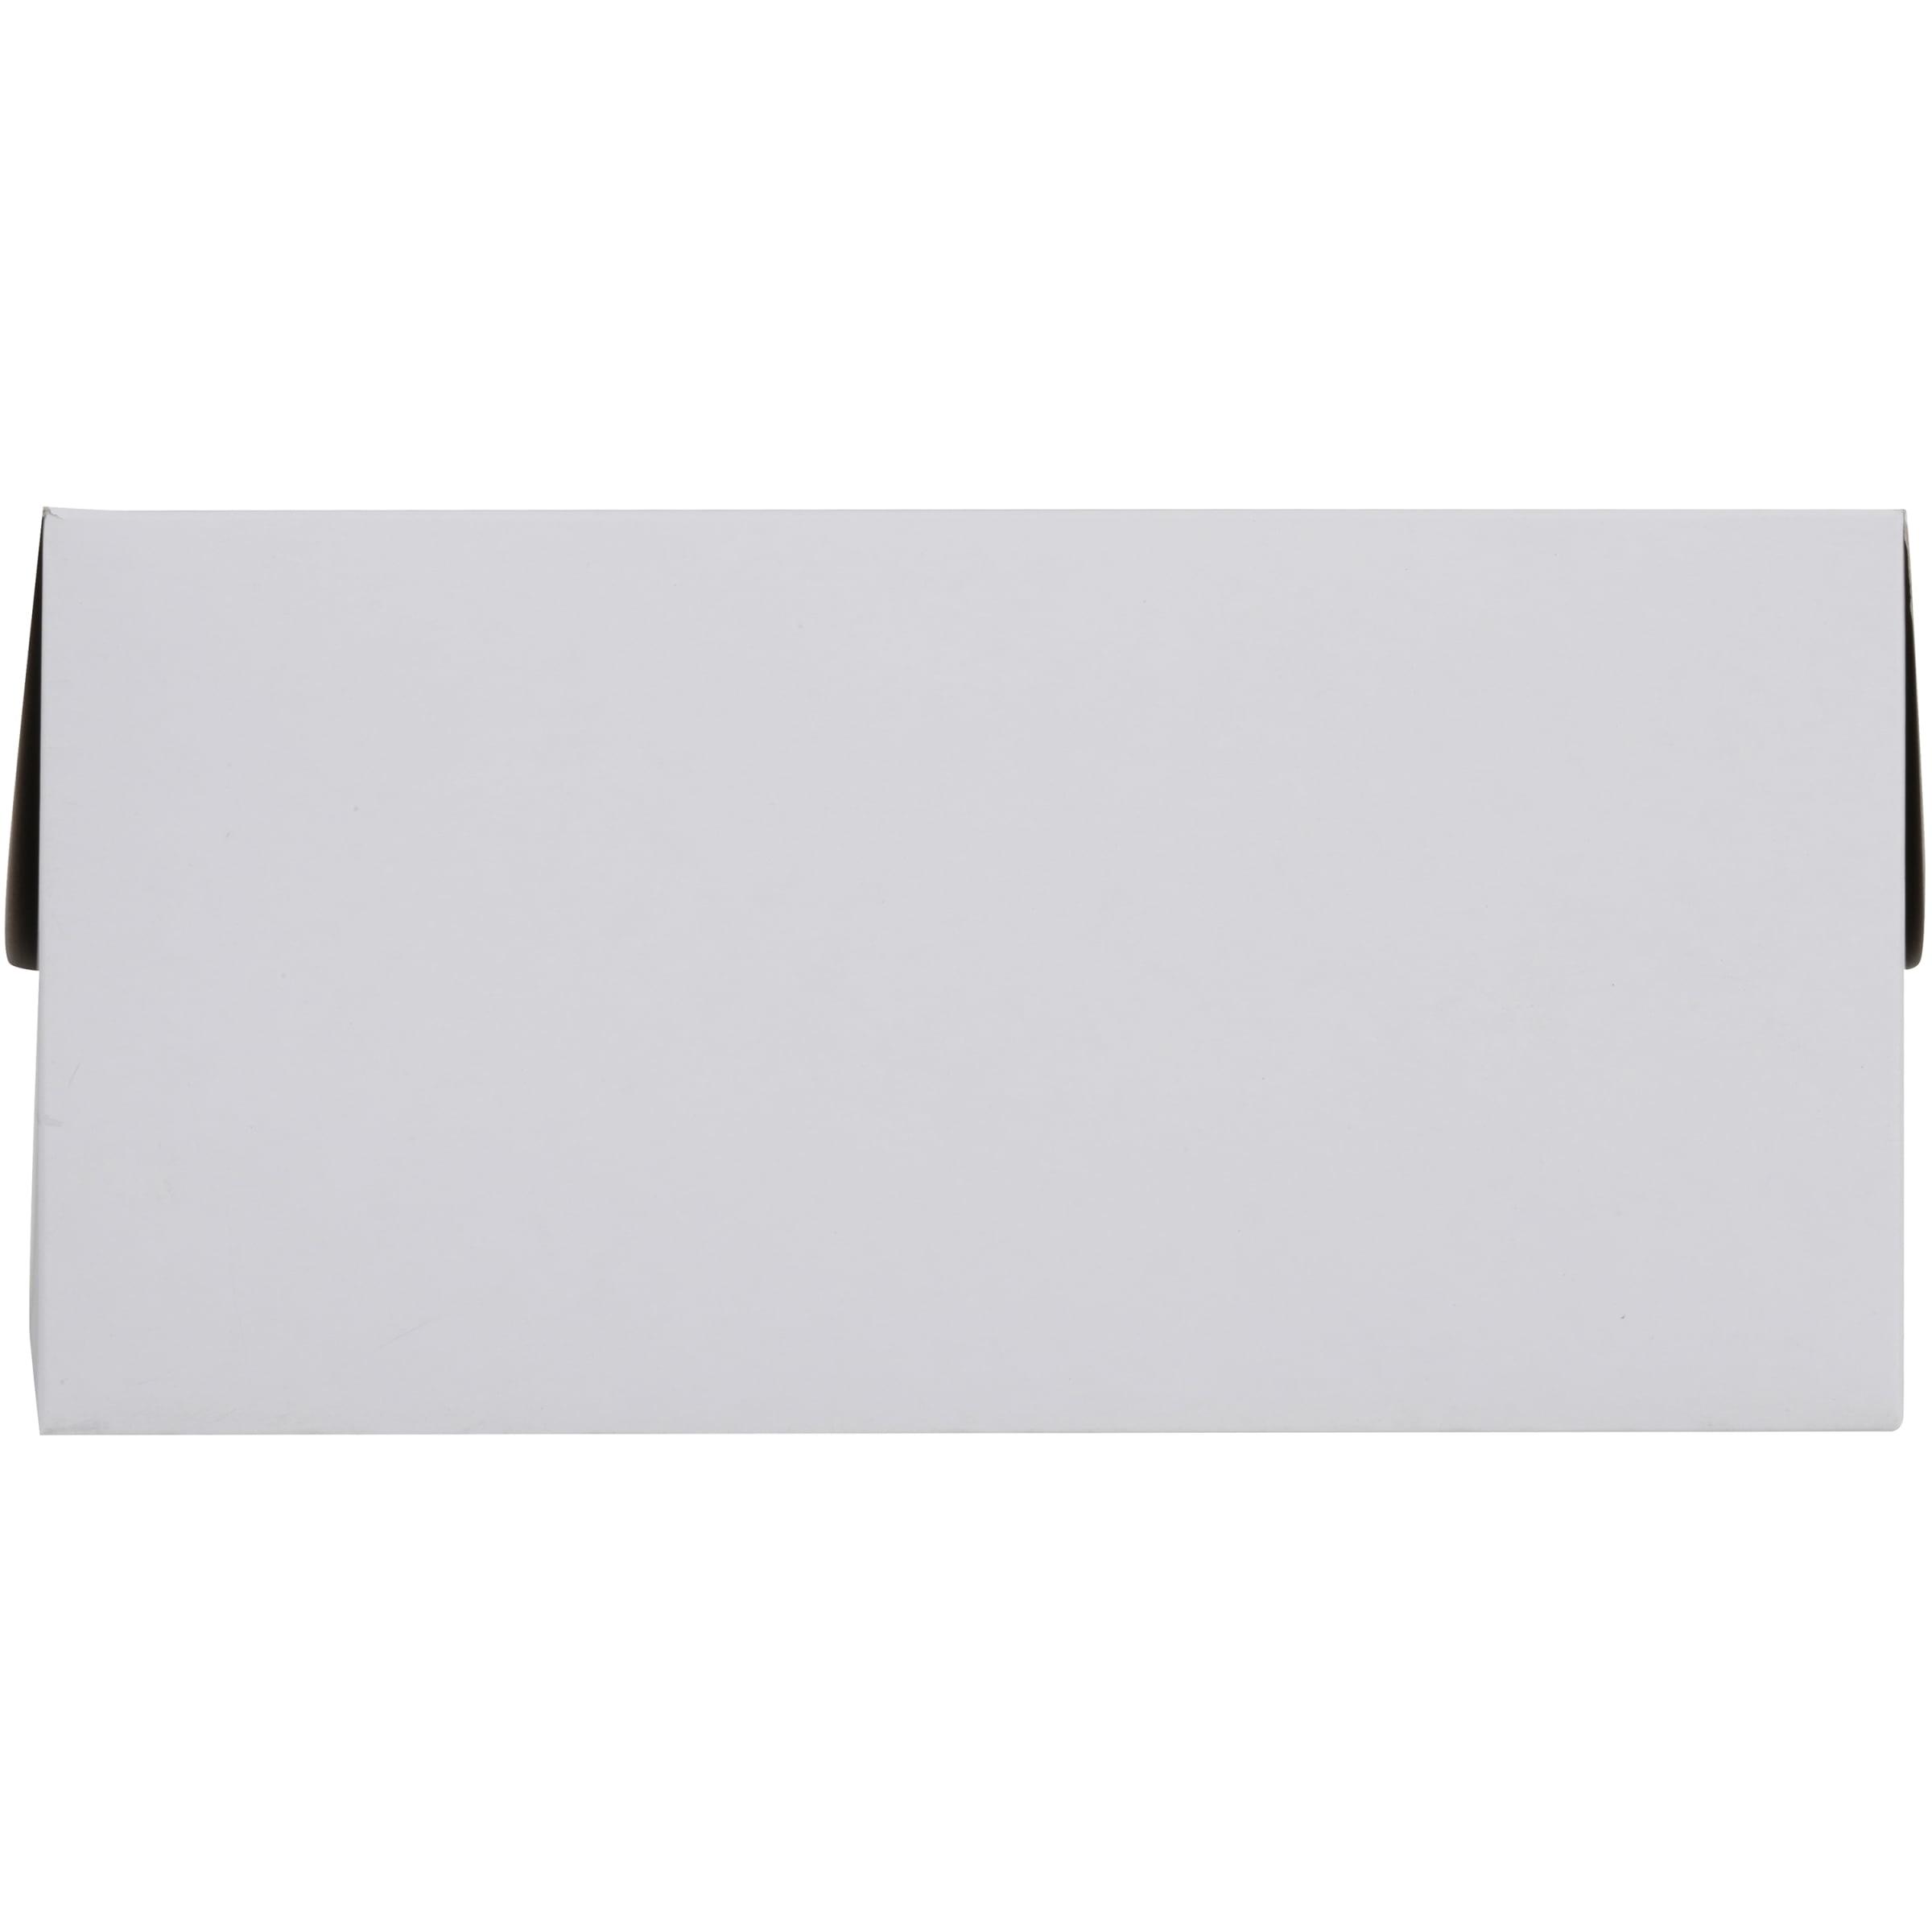 20 x Double Wall Cardboard Boxes 12 x 12 x 12 inch 30.4cm x 30.4cm x 30.4cm